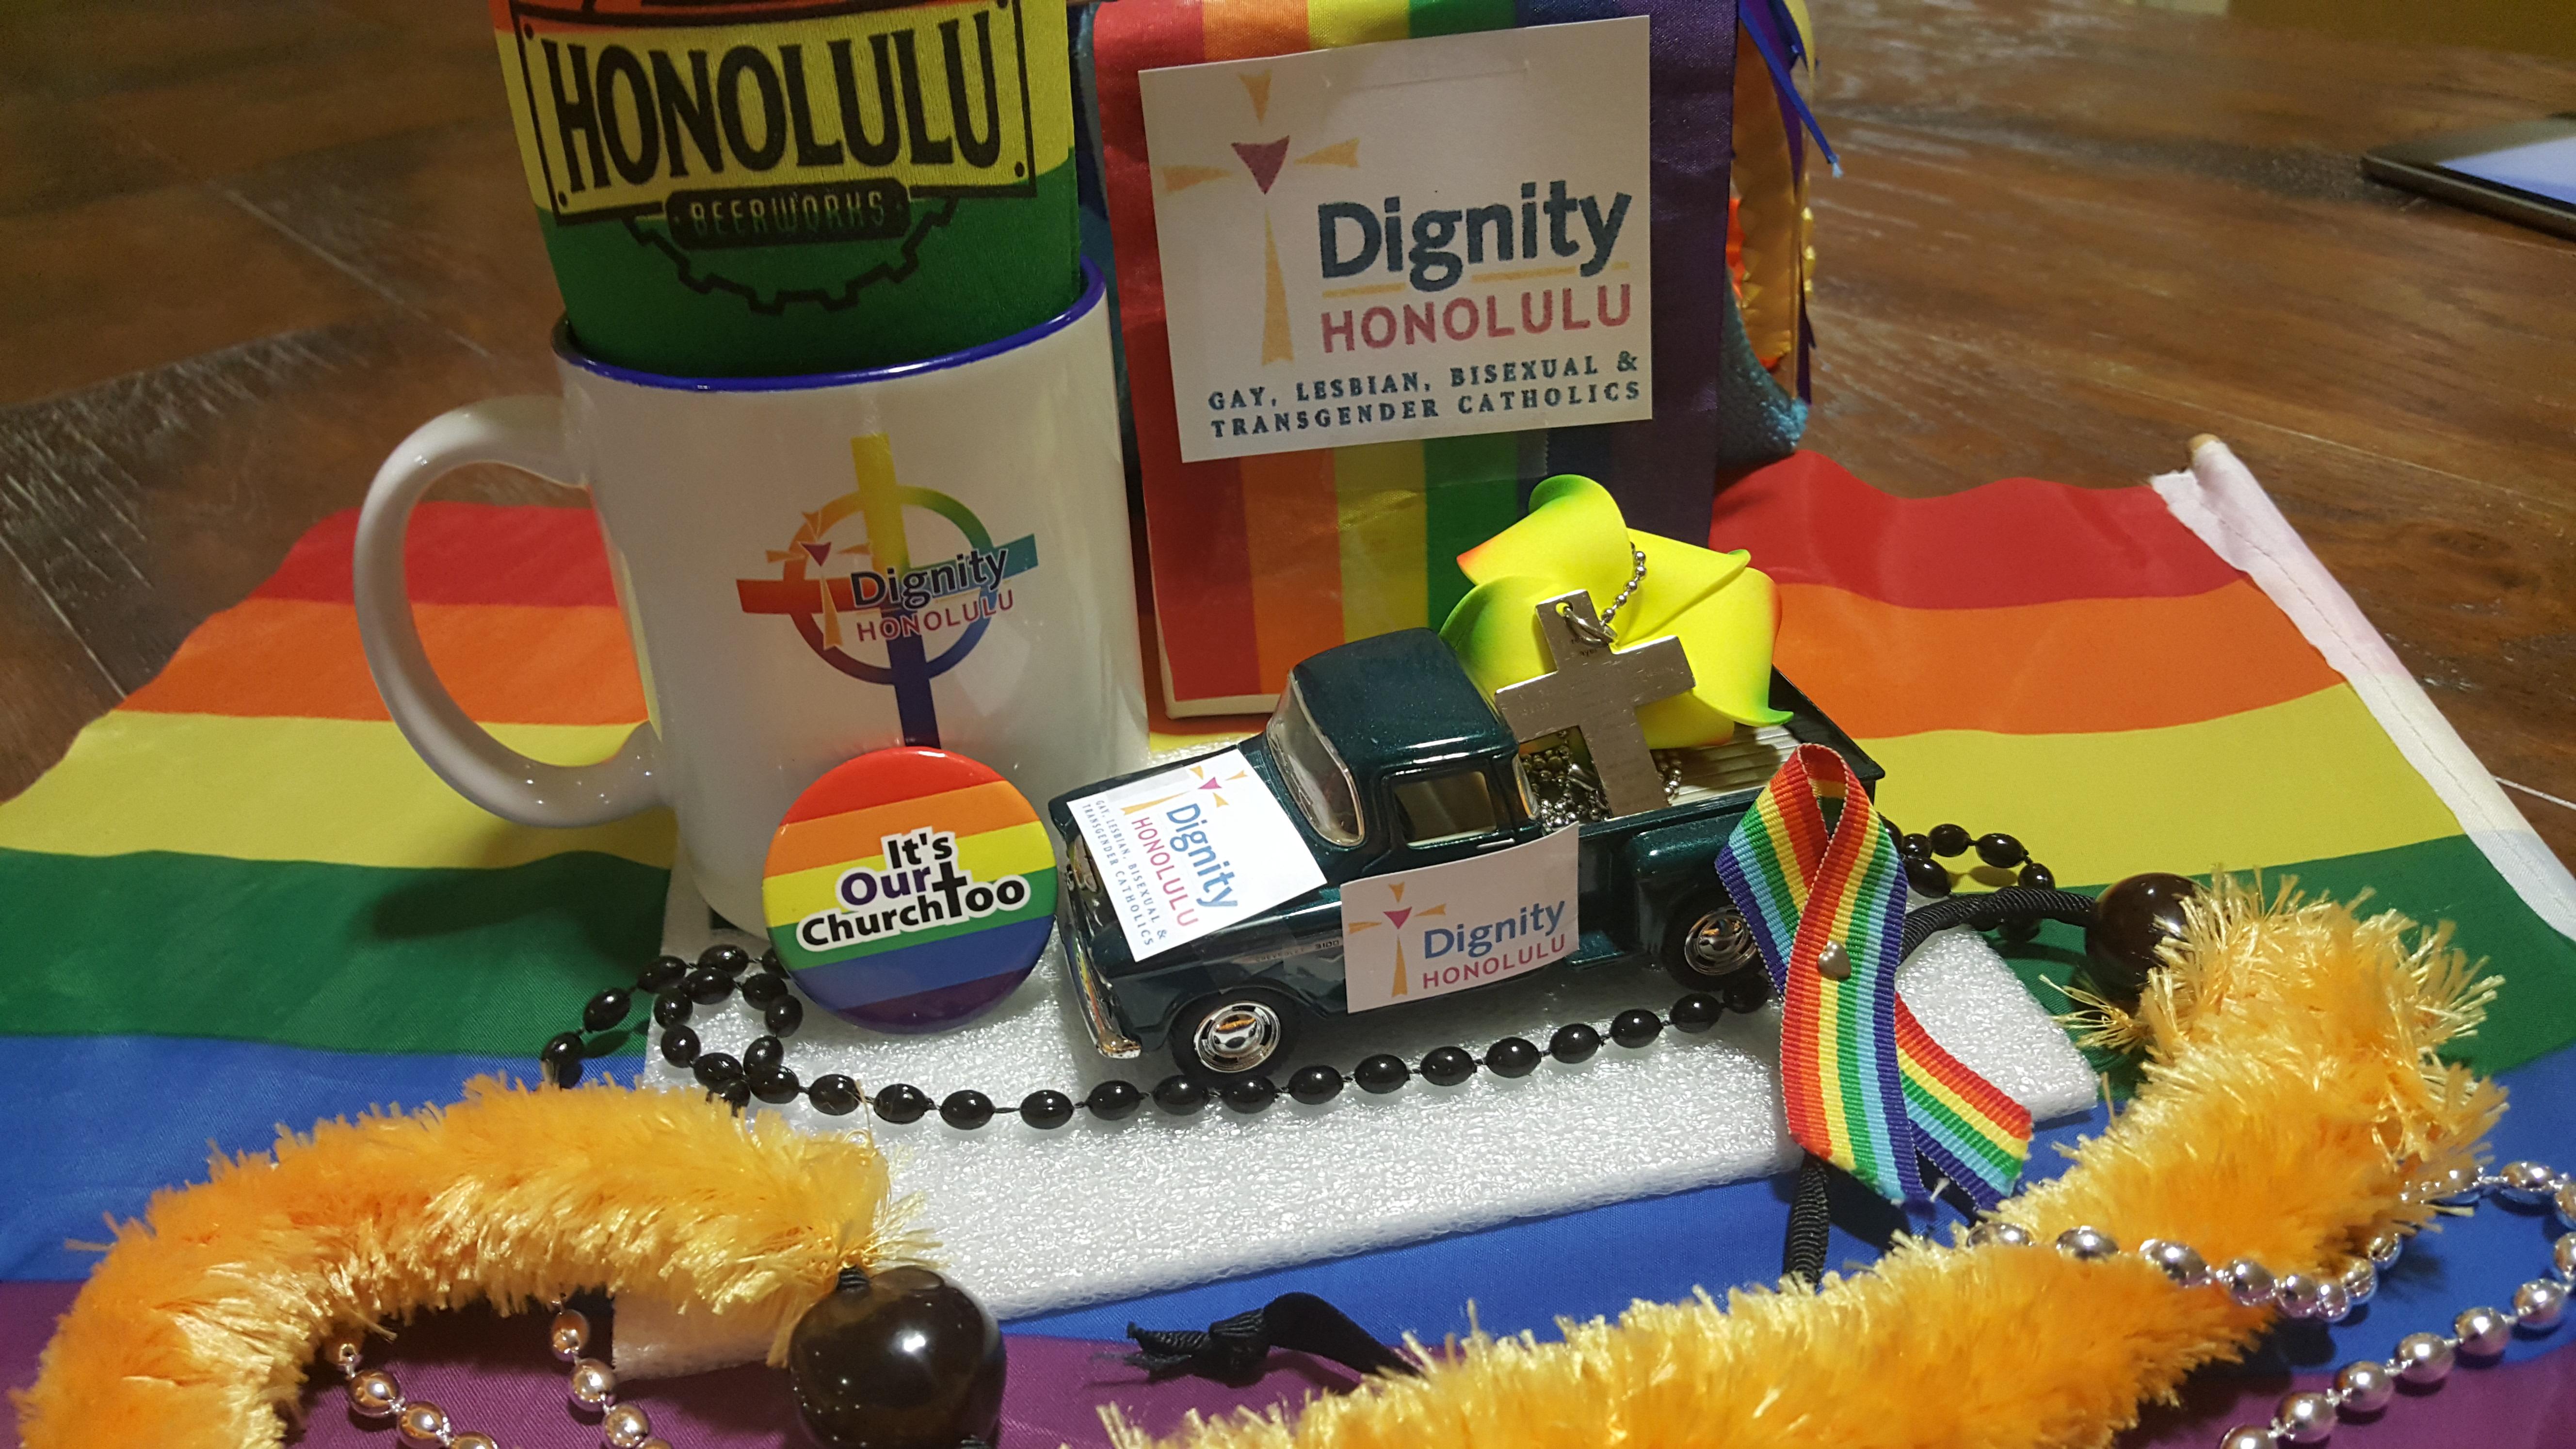 Dignity Honolulu Tiny Float for Honolulu Virtual Pride Parade 2020